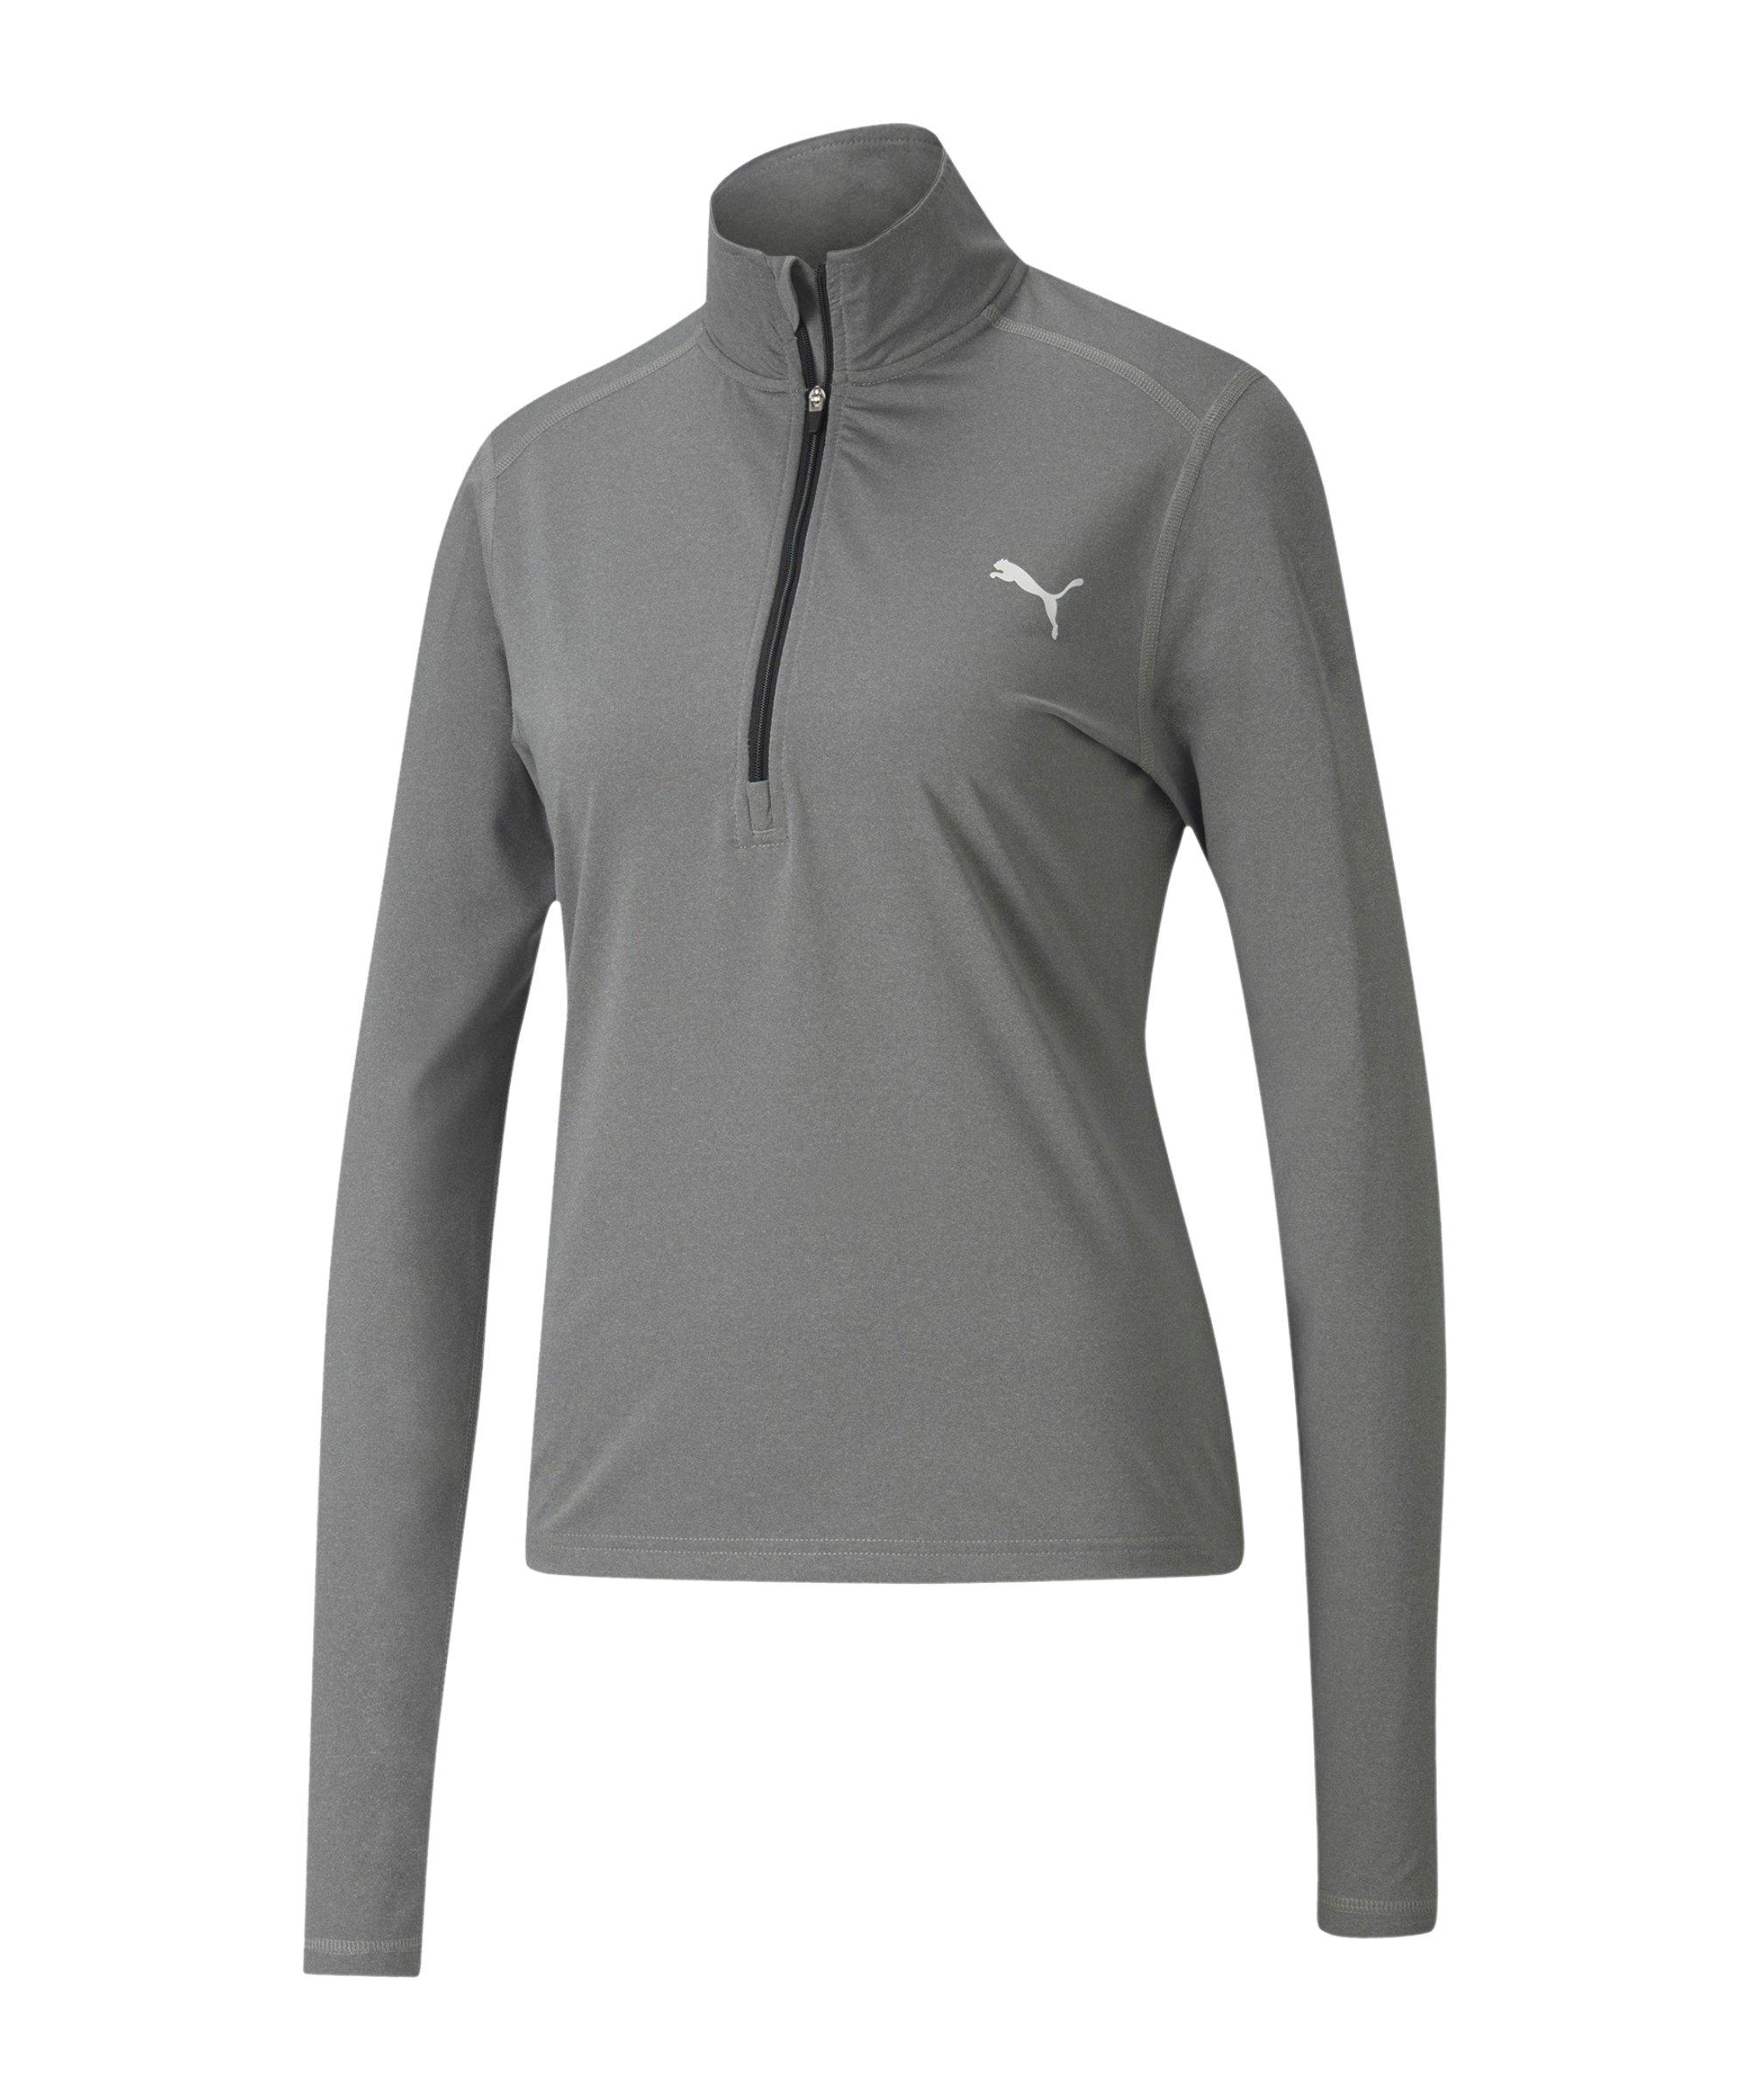 PUMA Cross the Line HalfZip Sweatshirt Damen F01 - grau